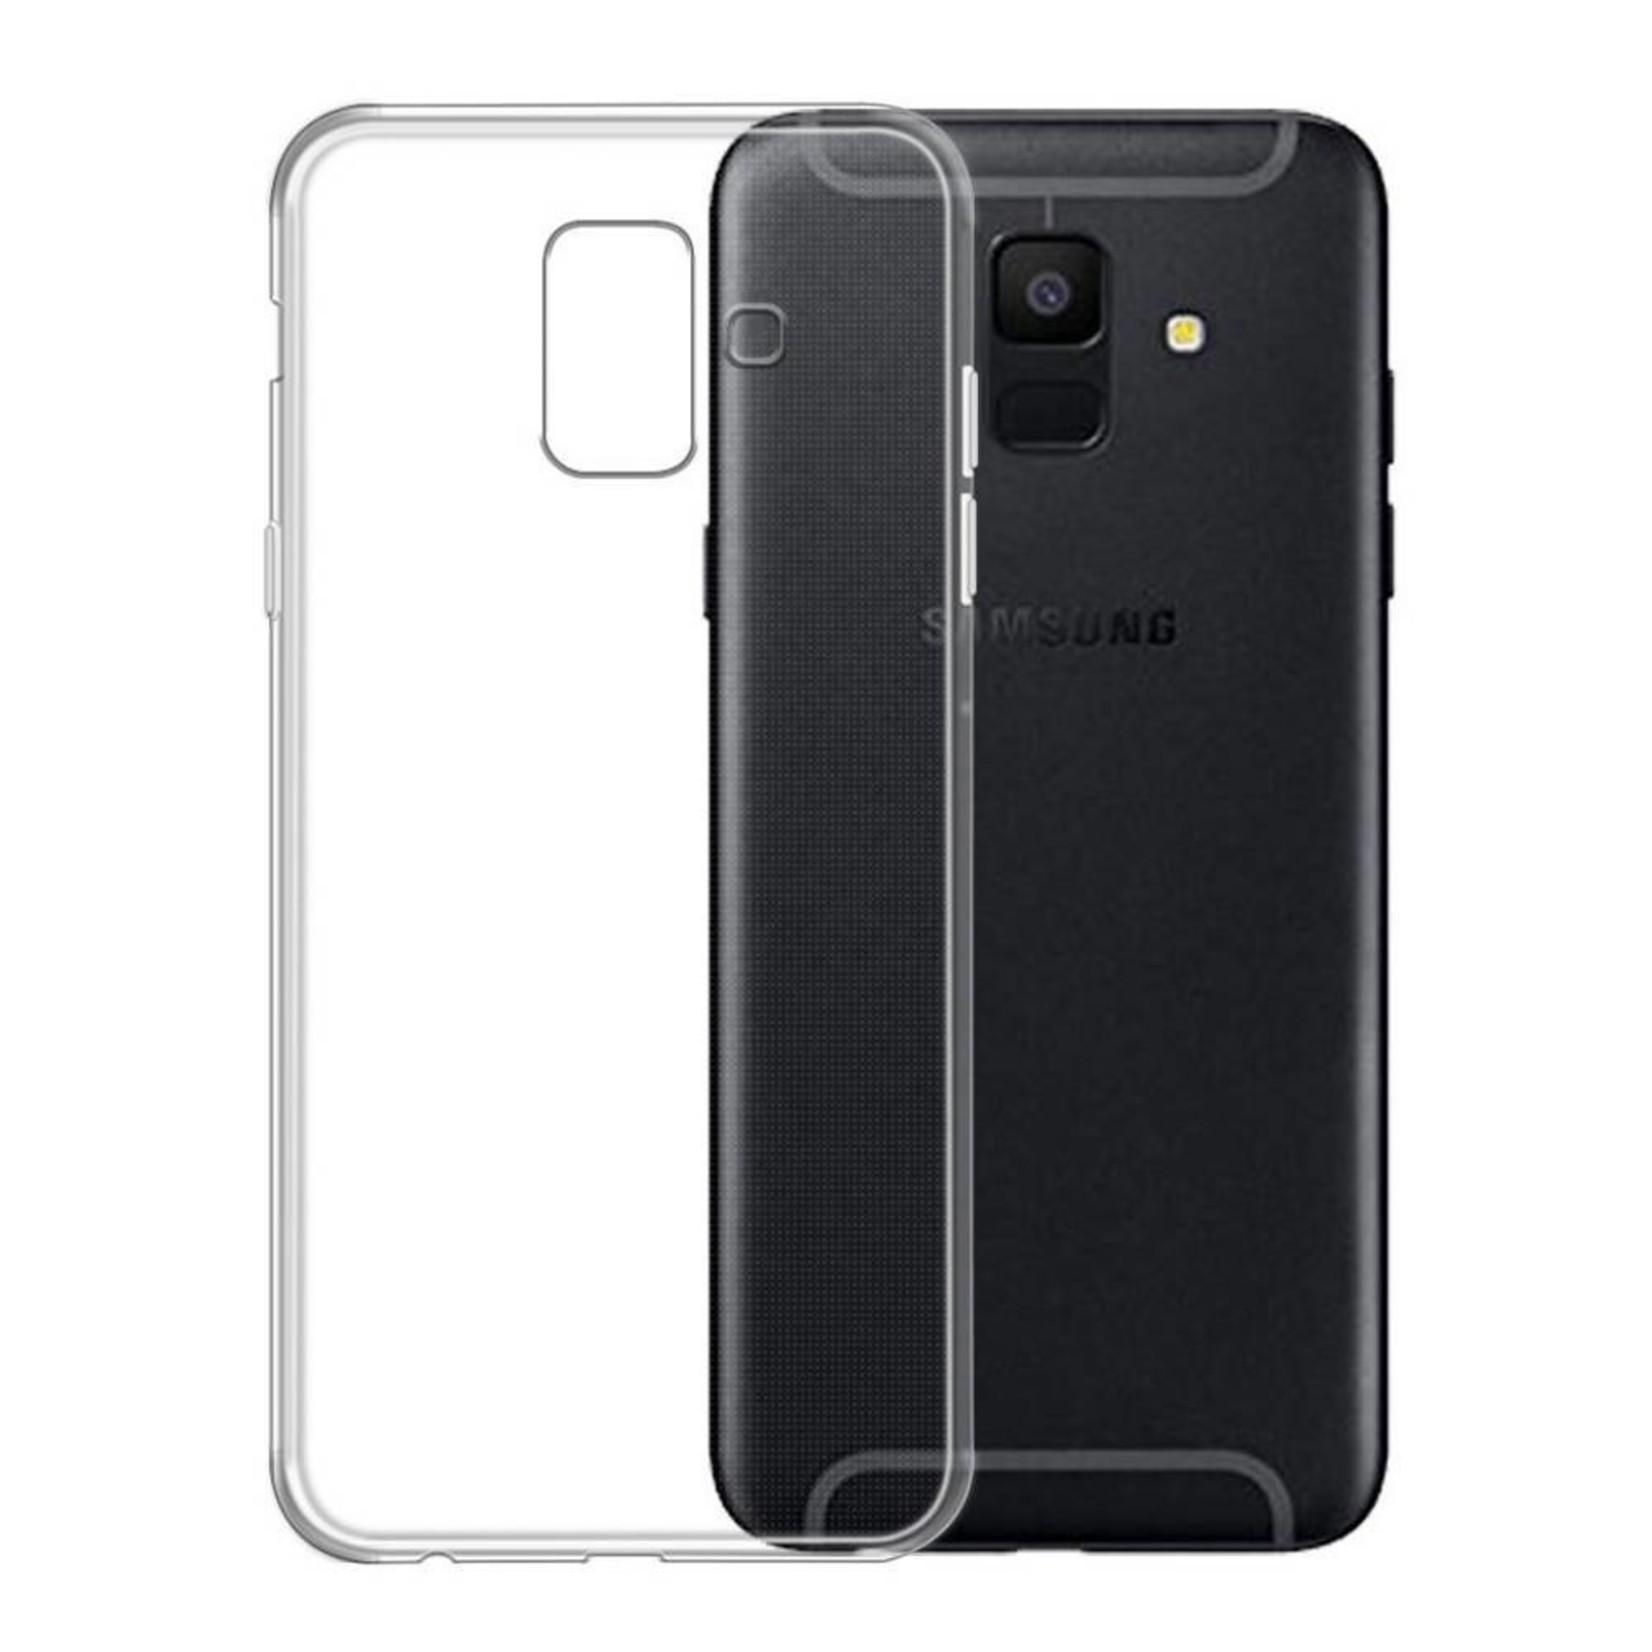 Colorfone Hoesje CoolSkin3T voor Samsung J6 Plus Transparant Wit